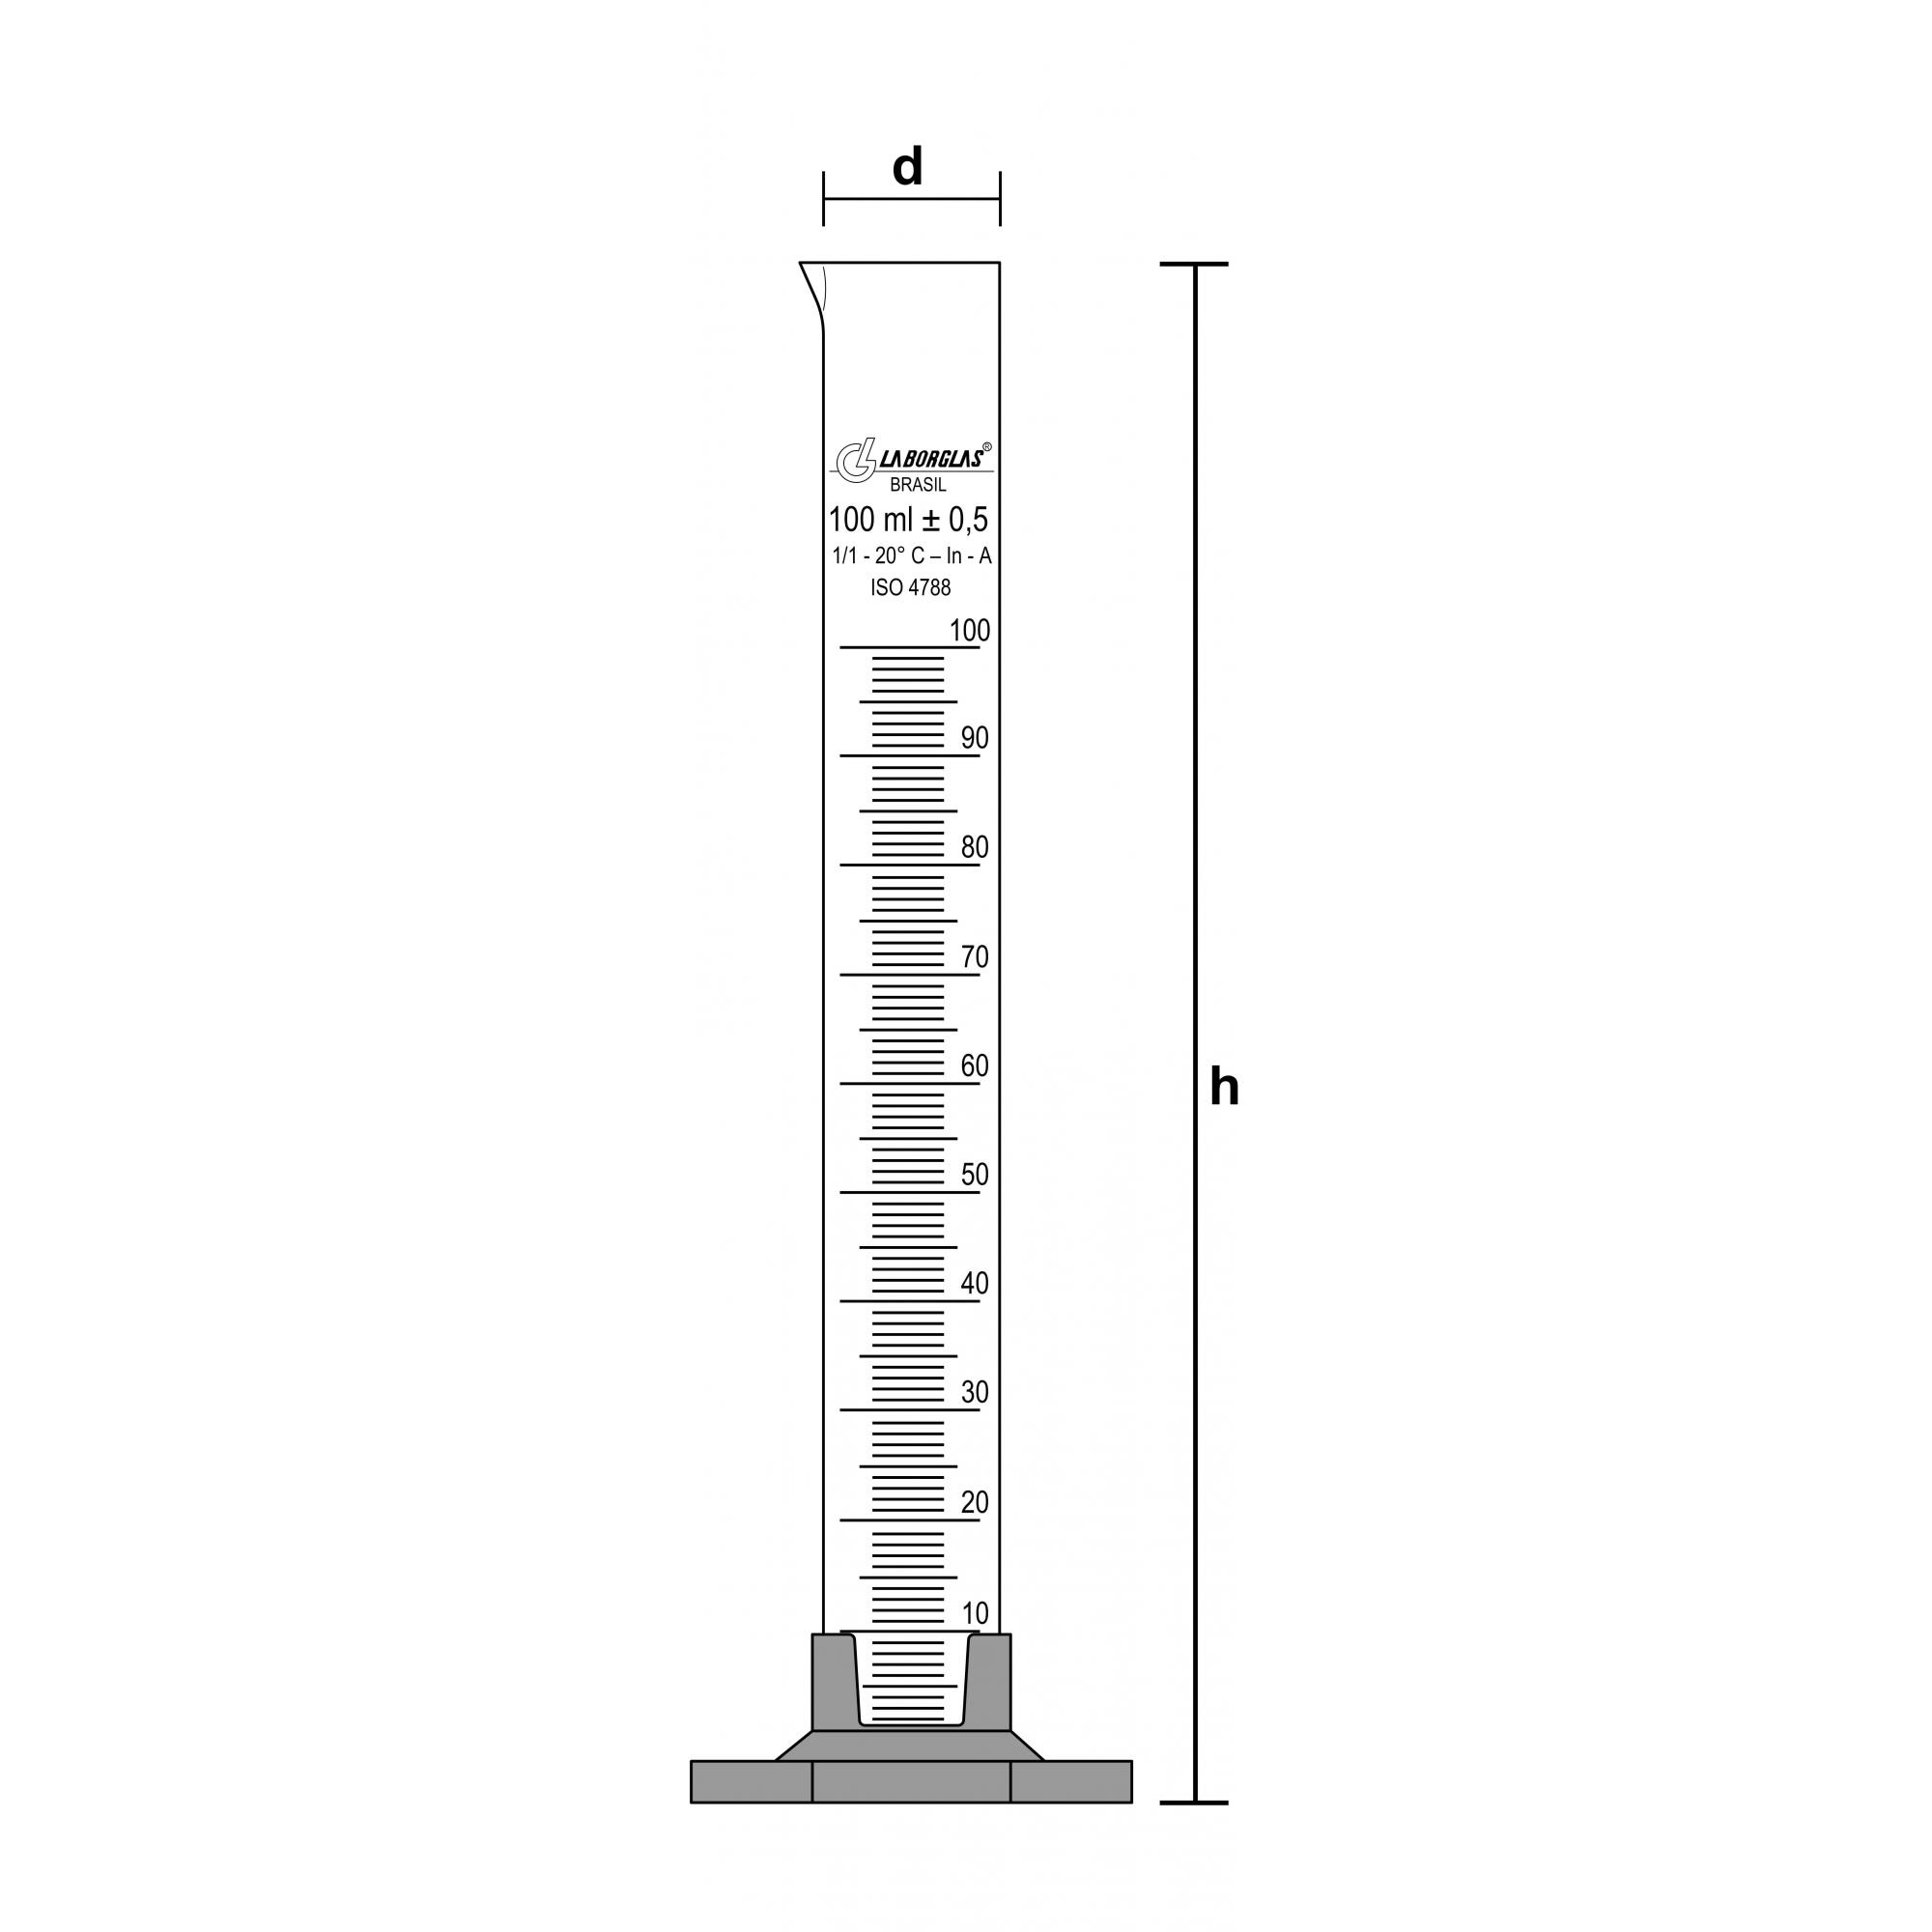 PROVETA GRADUADA BASE HEXAGONAL DE POLIPROPILENO CLASSE A 250 ML - Laborglas - Cód. 9138736